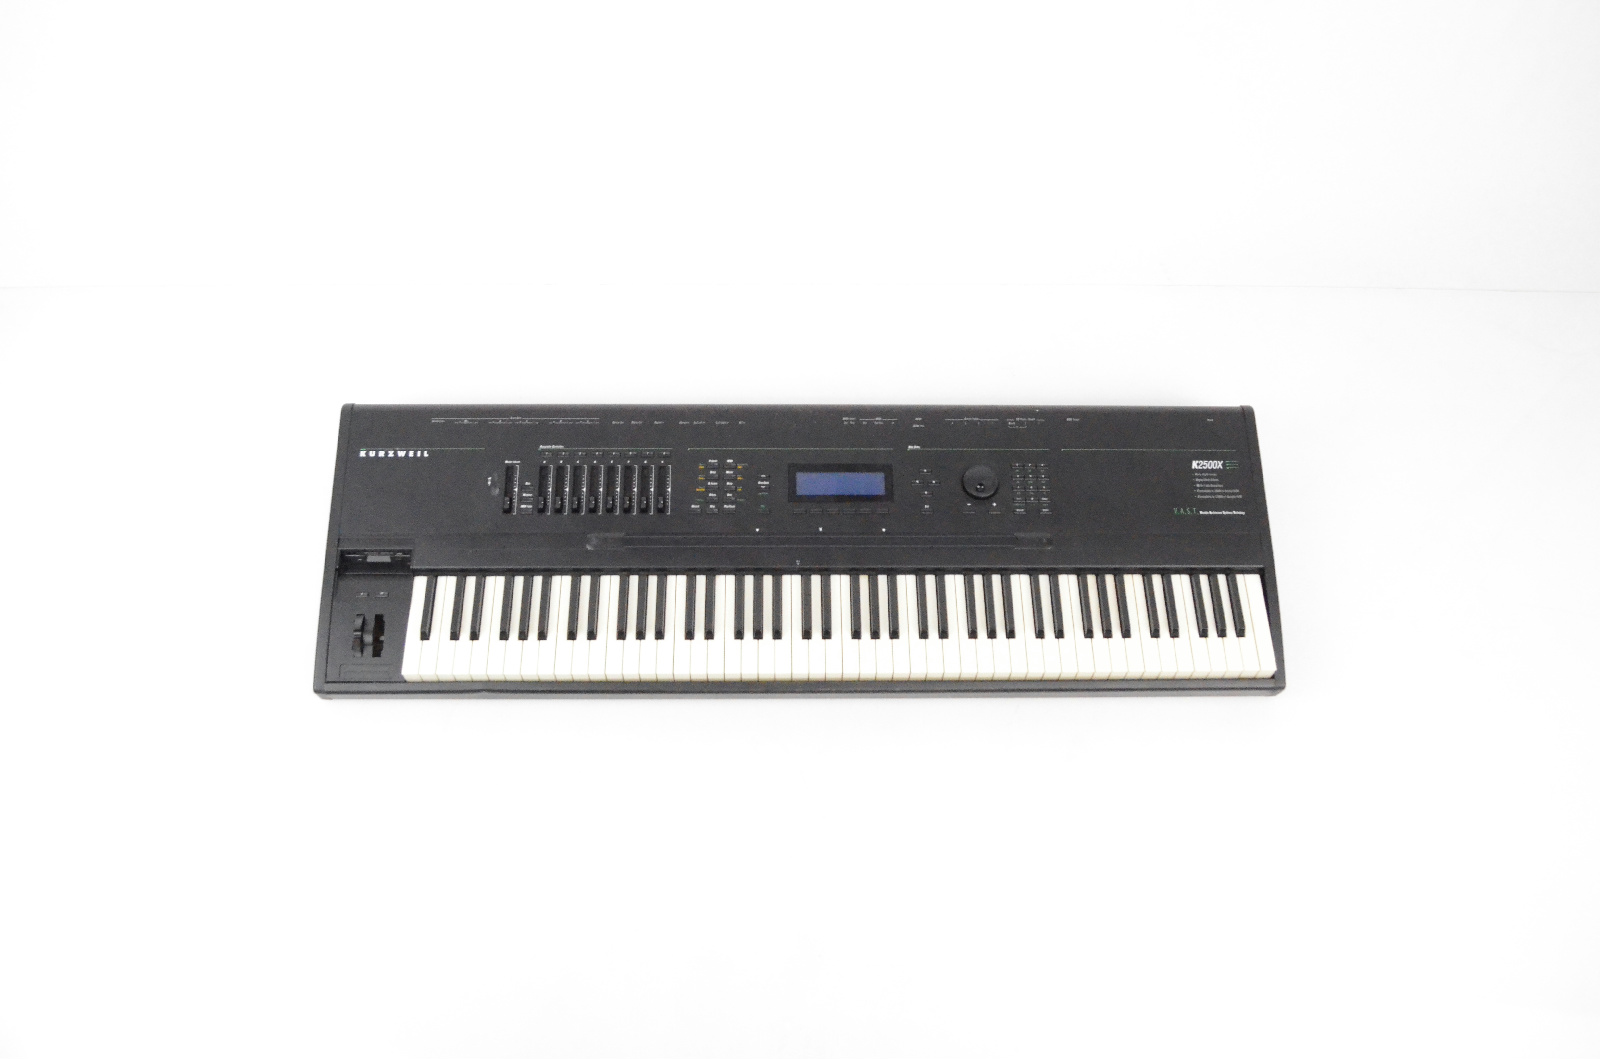 Kurzweil K2500X Sampler Workstation Keyboard K2500XS Owned by Lyle Mays #32691